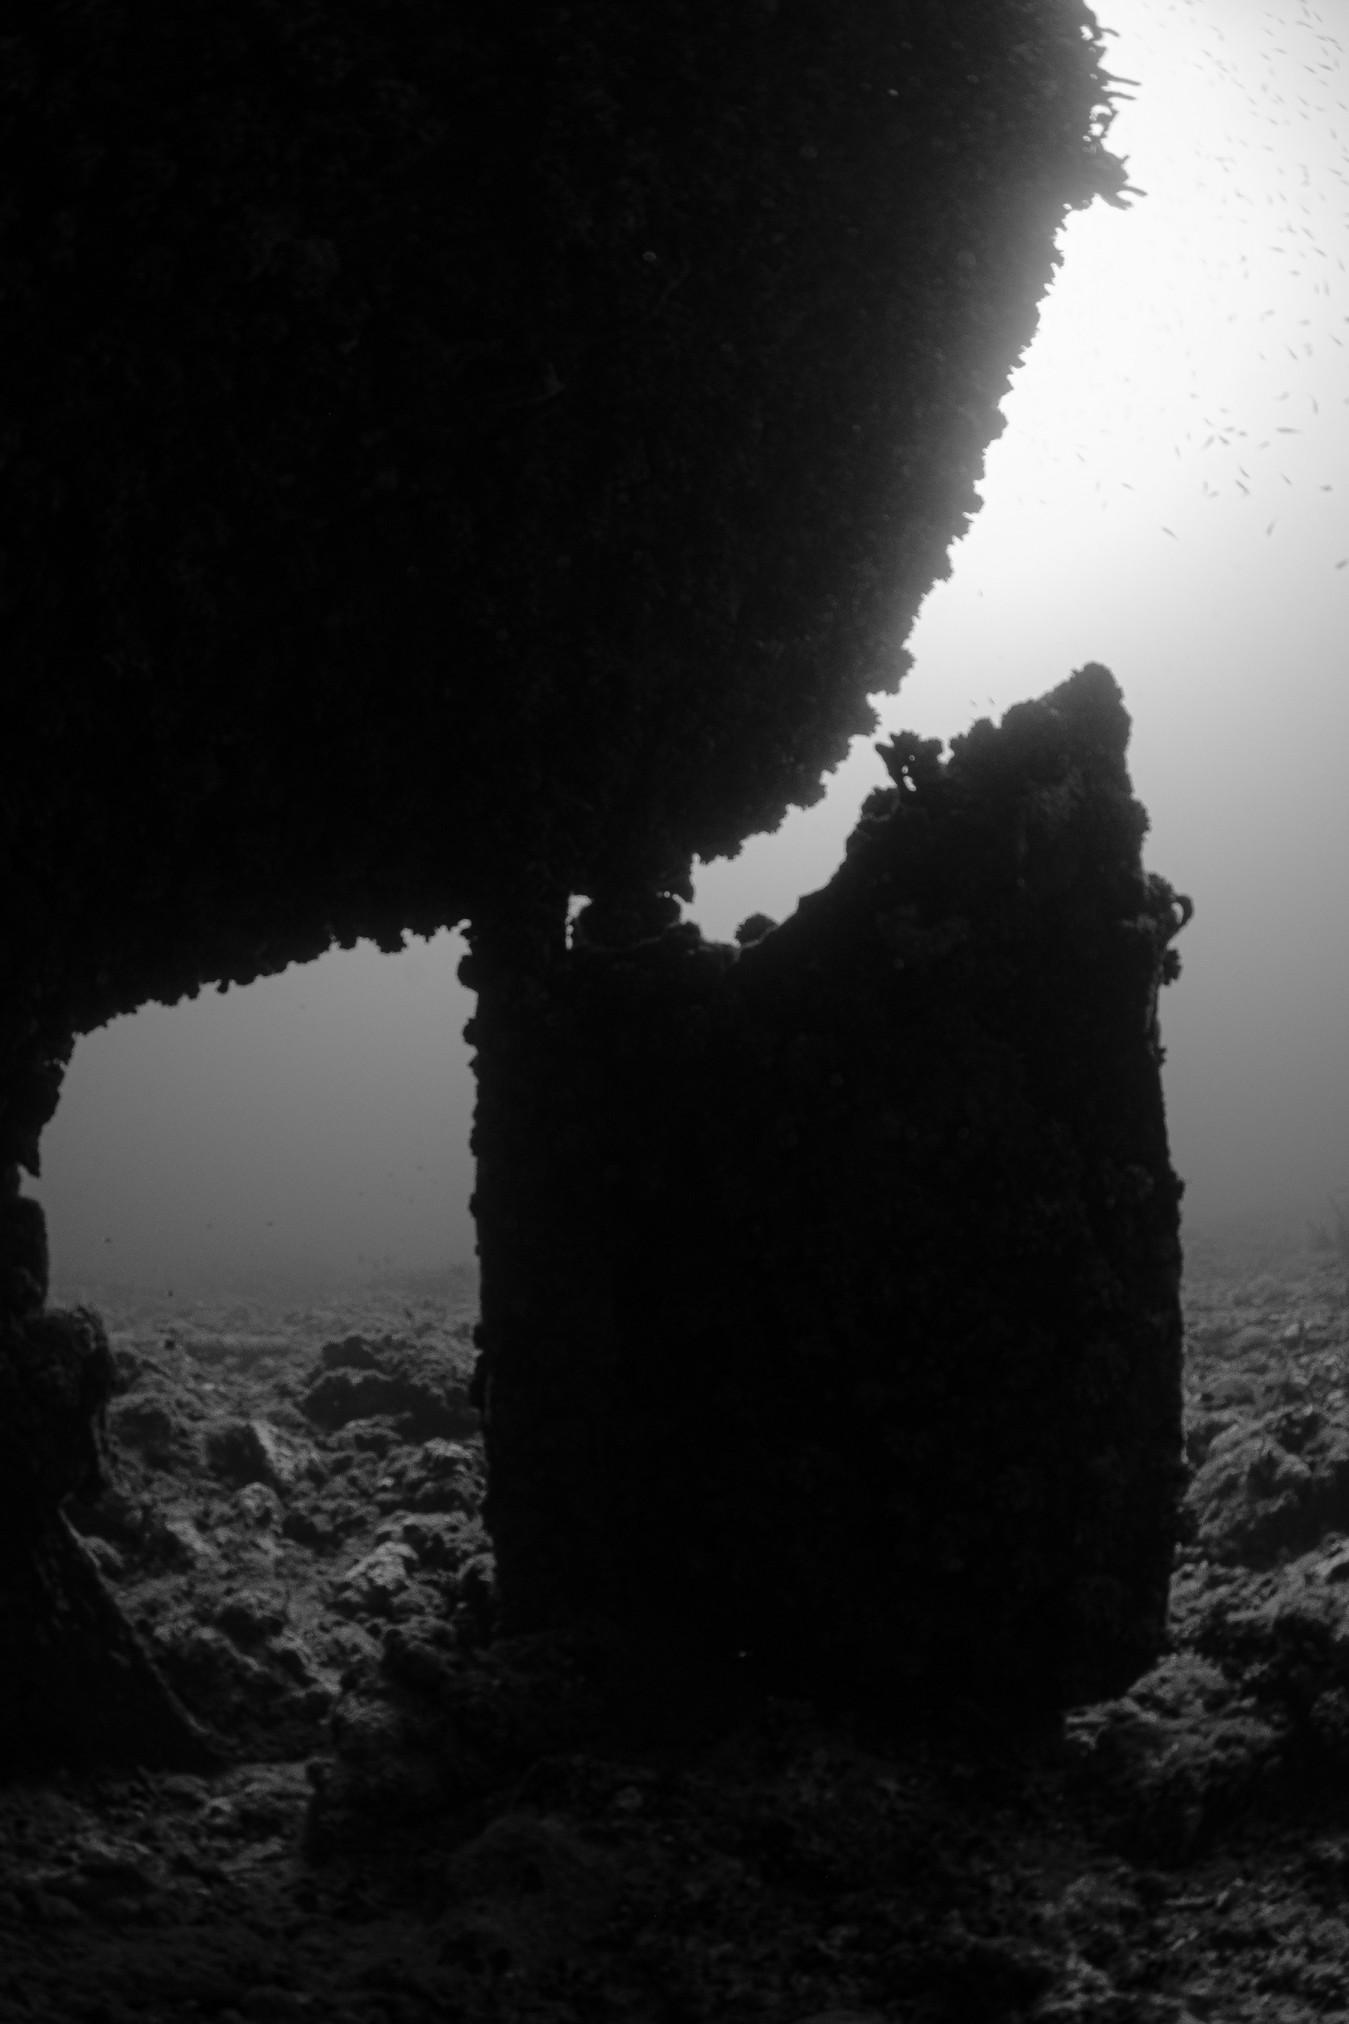 black-and-white shot of the Veronica L shipwreck